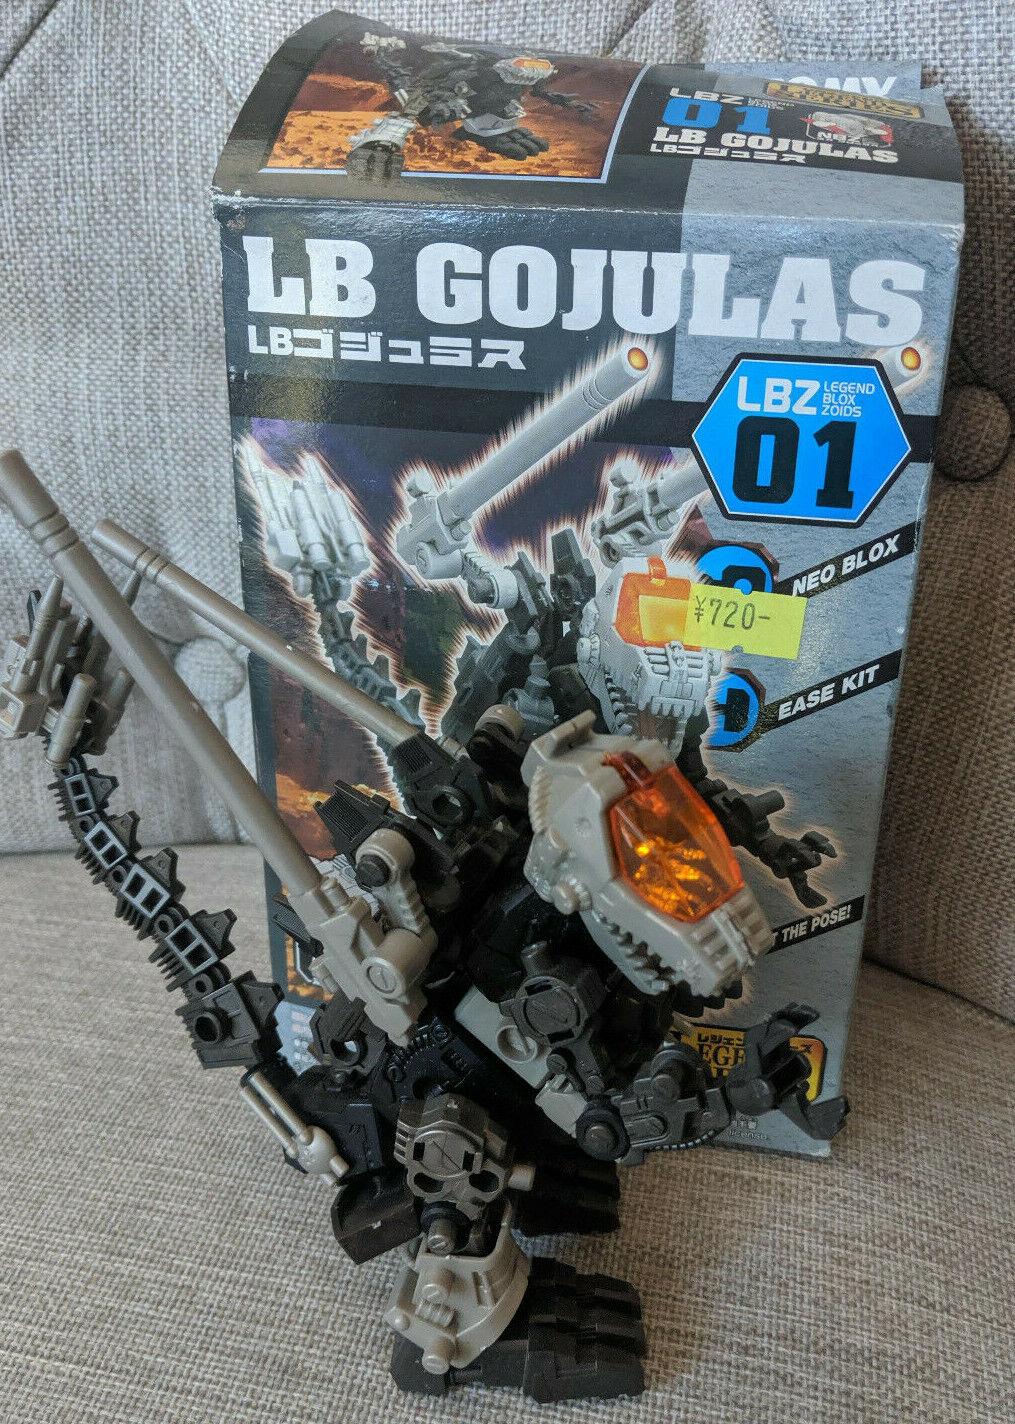 Zoids Genesis LBZ01 LB Gojulas with Box